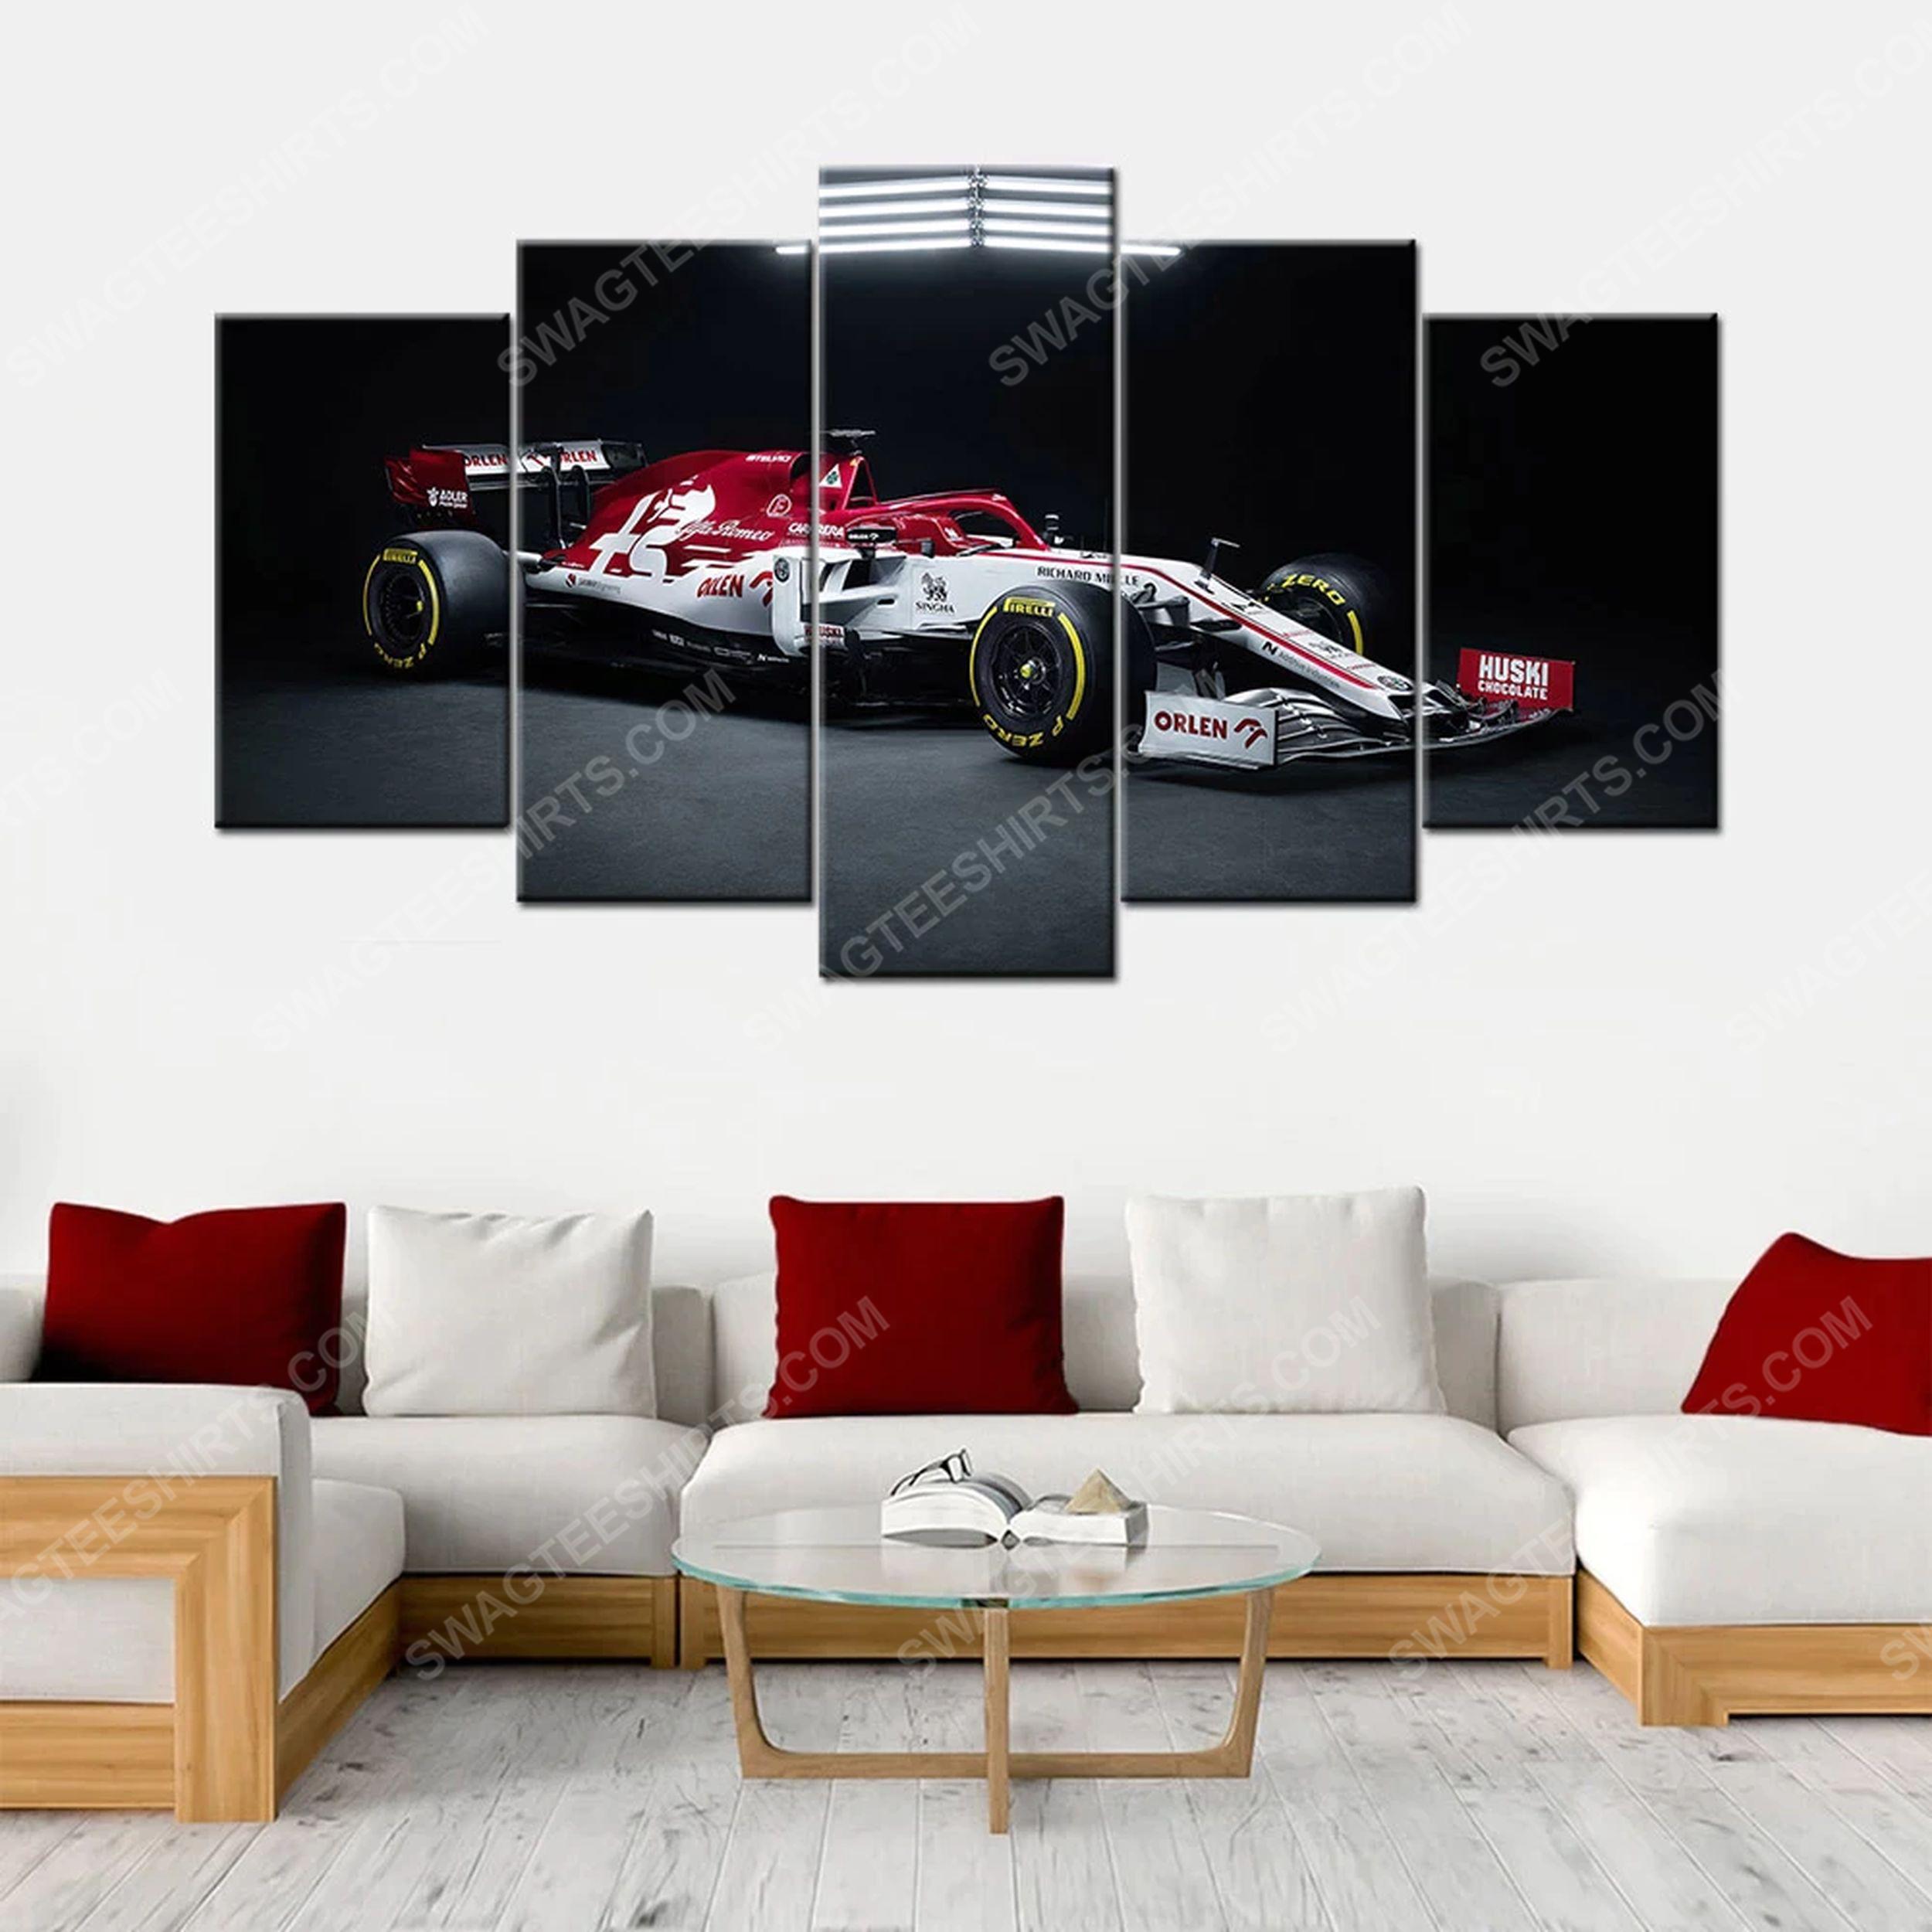 Alfa romeo c39 f1 racing car print painting canvas wall art home decor